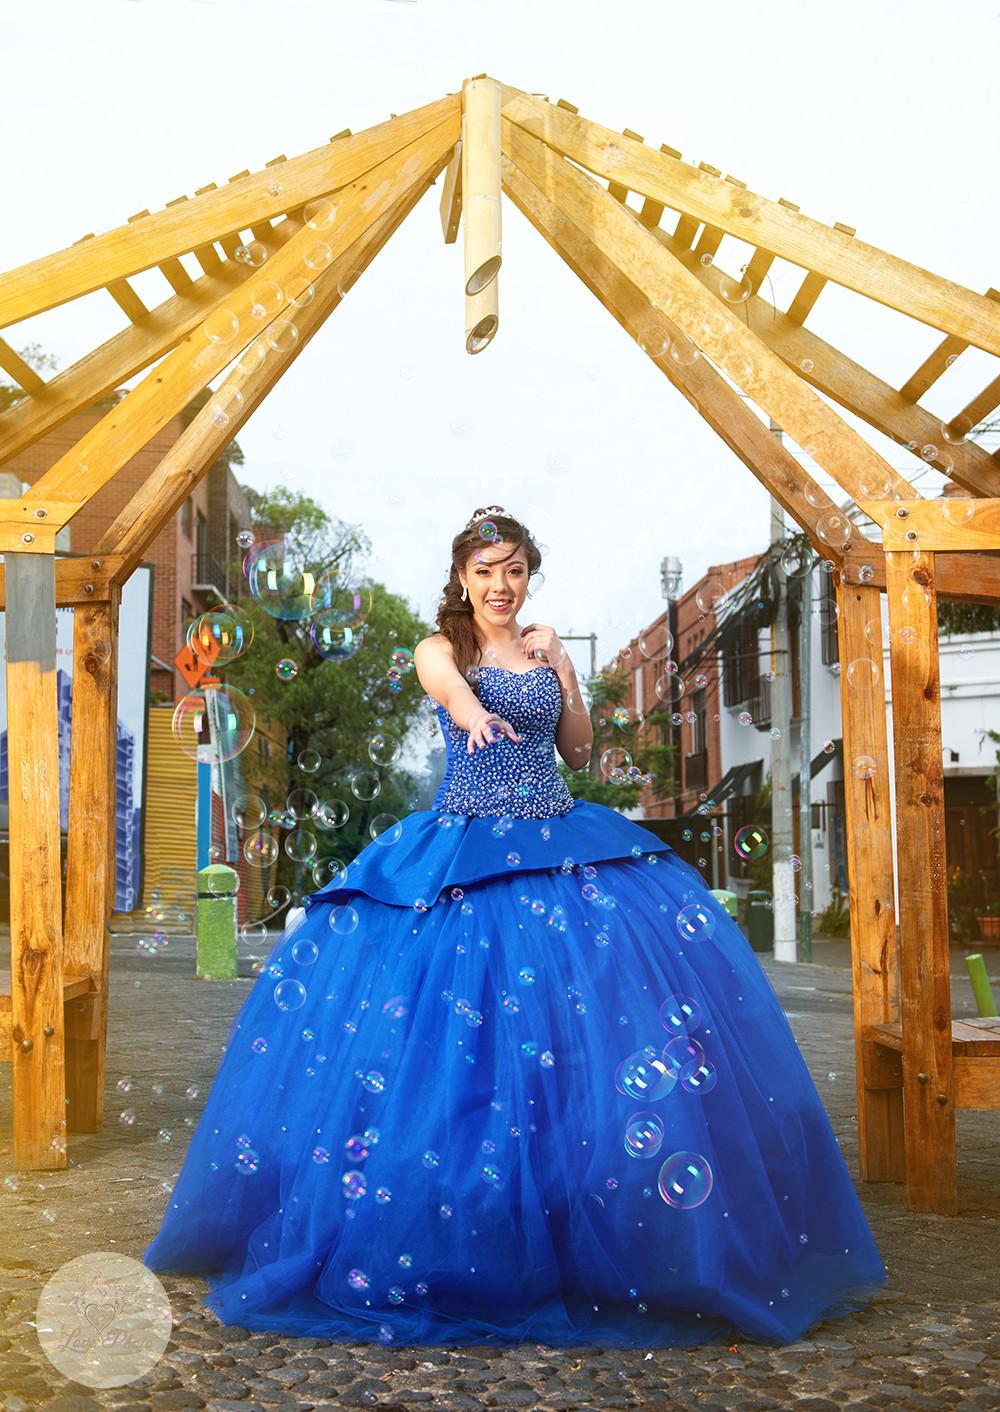 blue-dress-bubbles.jpg